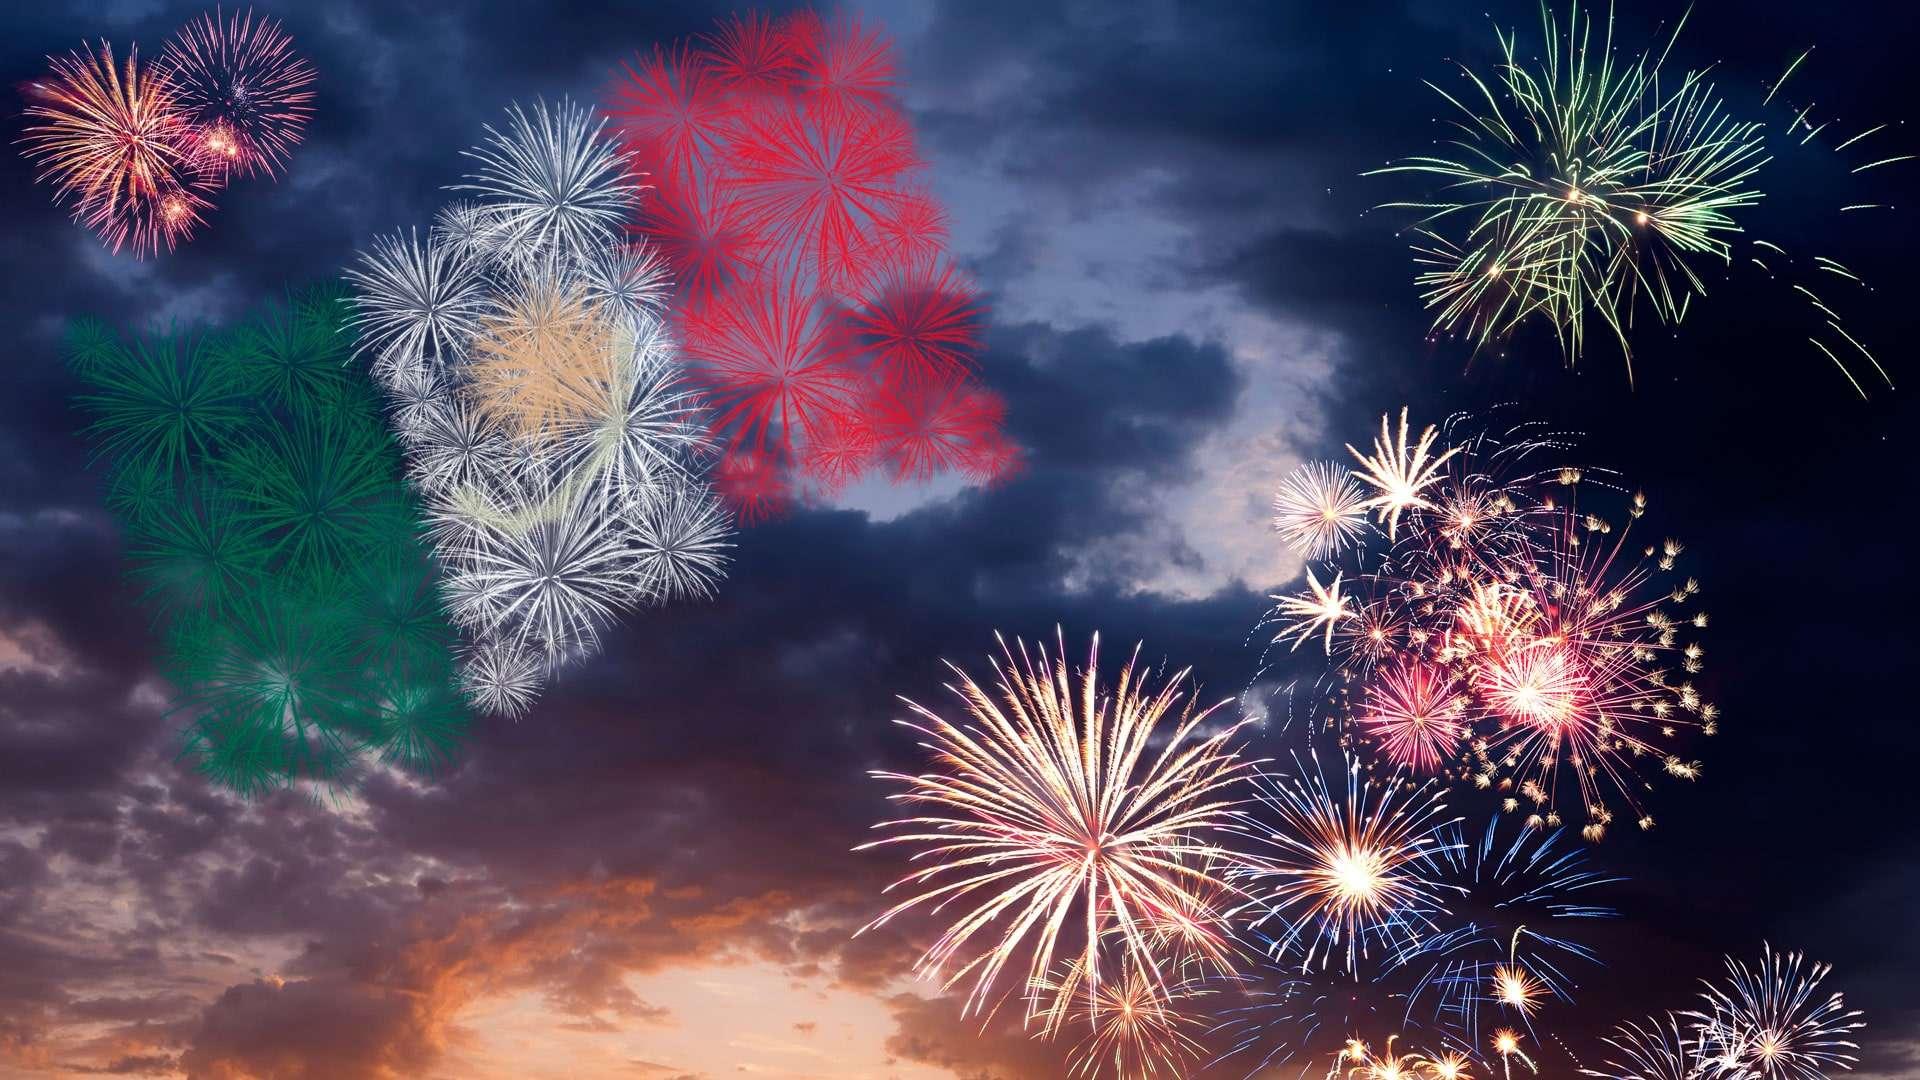 What Des Cinco De Mayo Celebrate